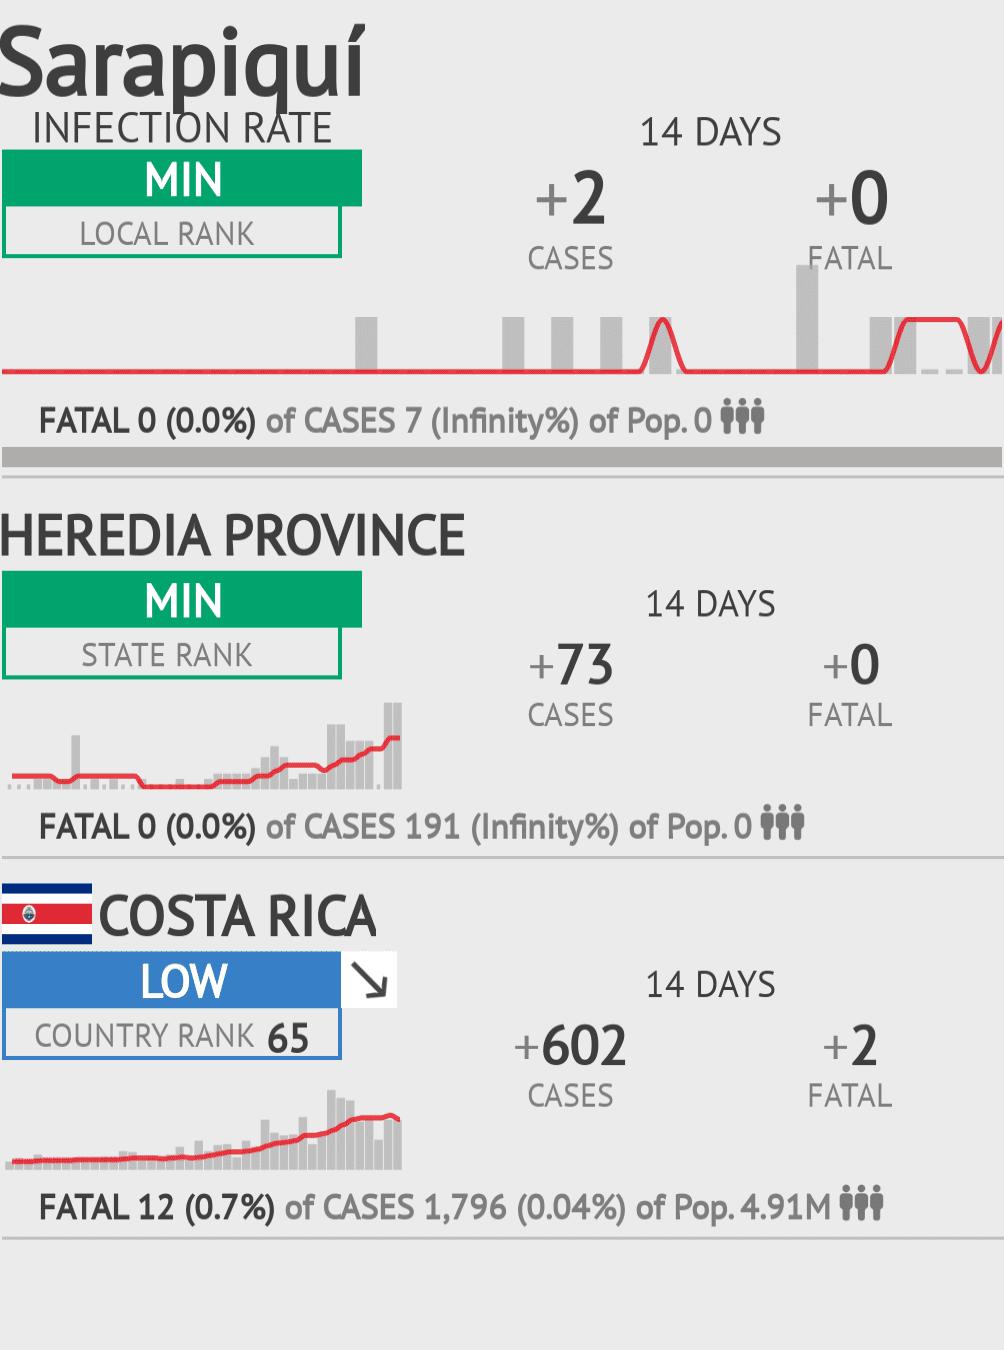 Sarapiquí Coronavirus Covid-19 Risk of Infection on July 29, 2021